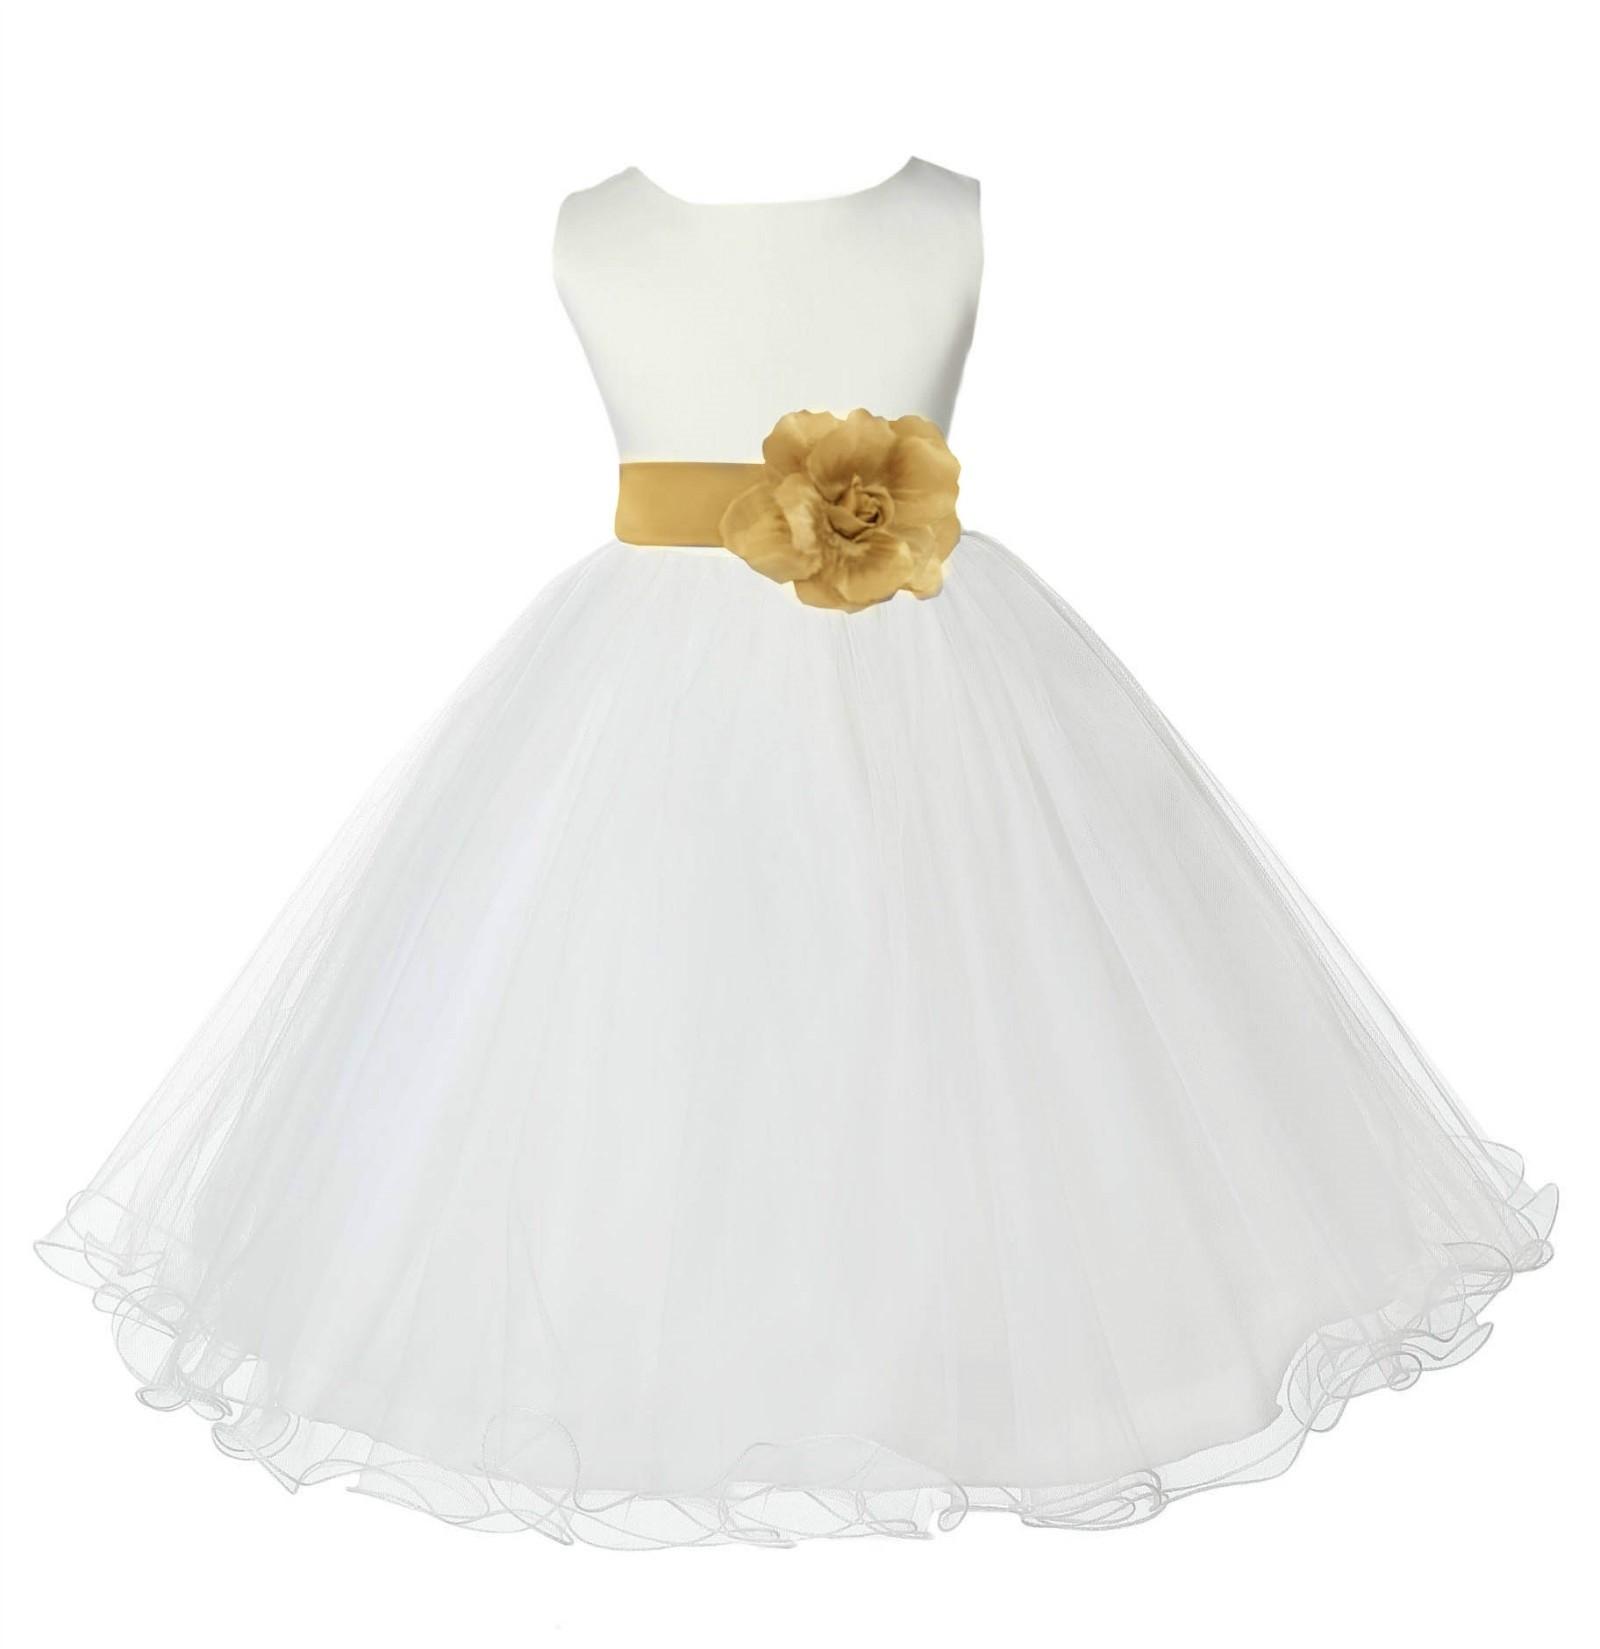 Ivory/Gold Tulle Rattail Edge Flower Girl Dress Pageant Recital 829S